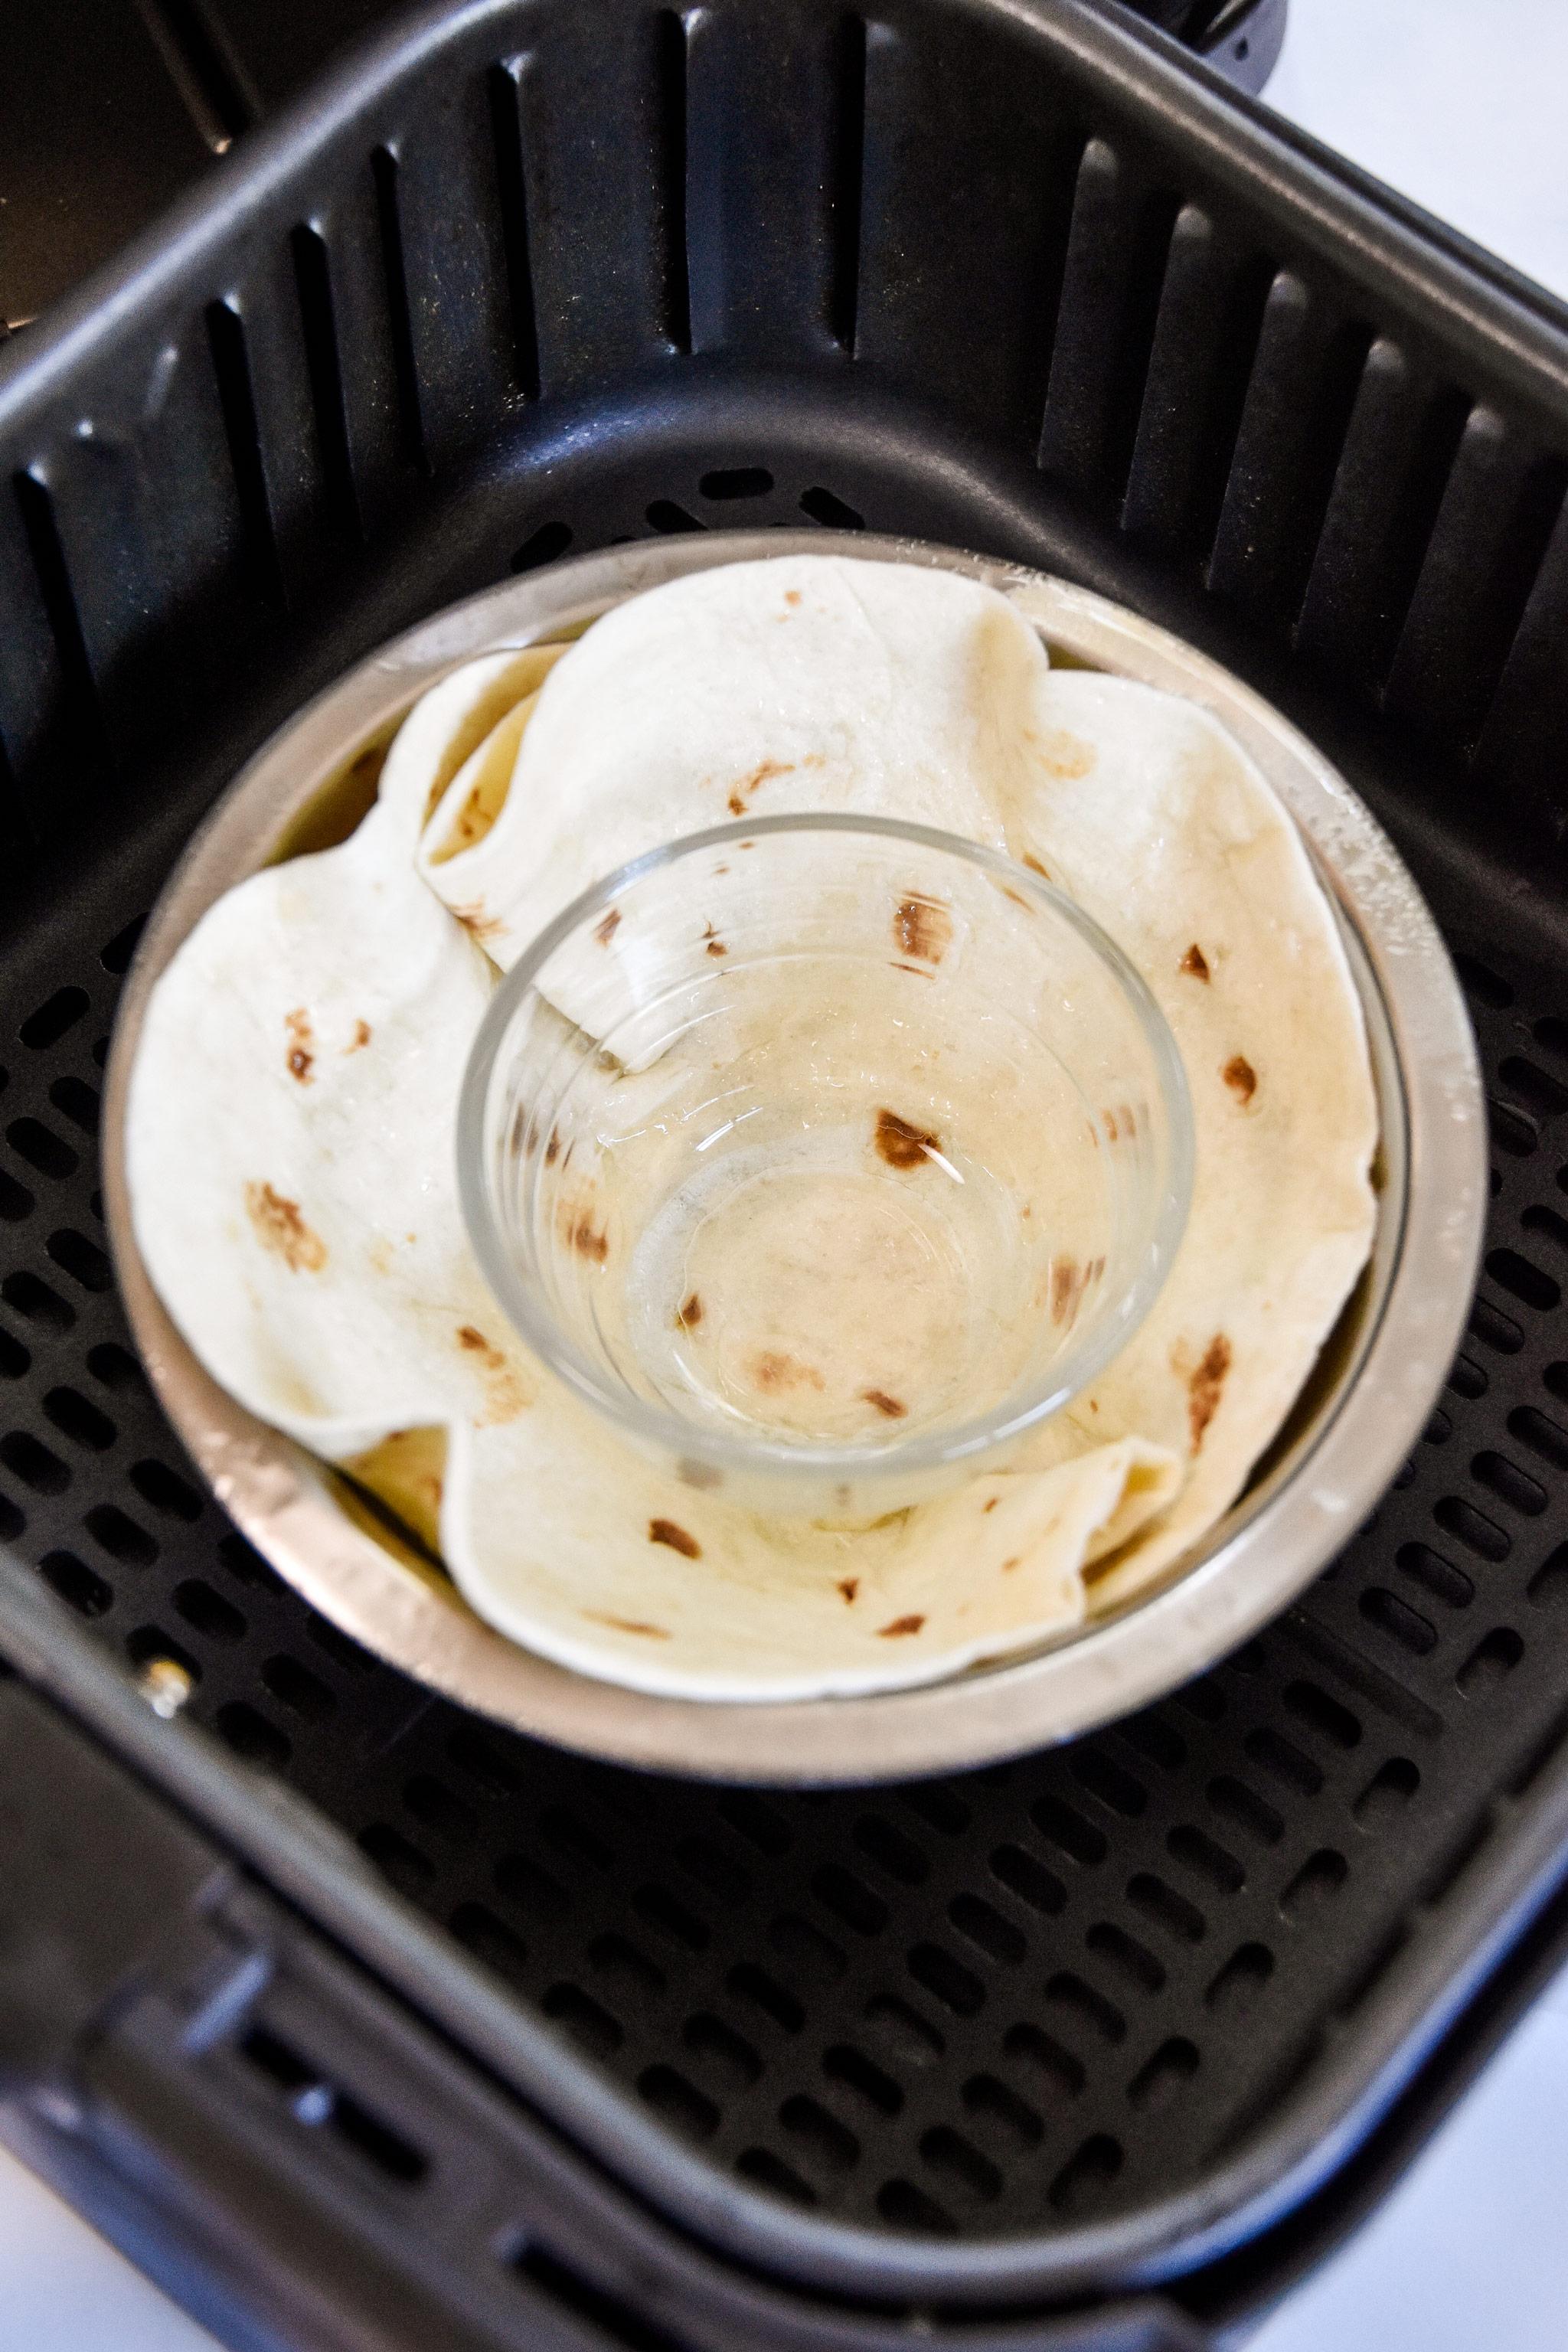 a flour tortilla between two bowls acting as a mold in an air fryer.